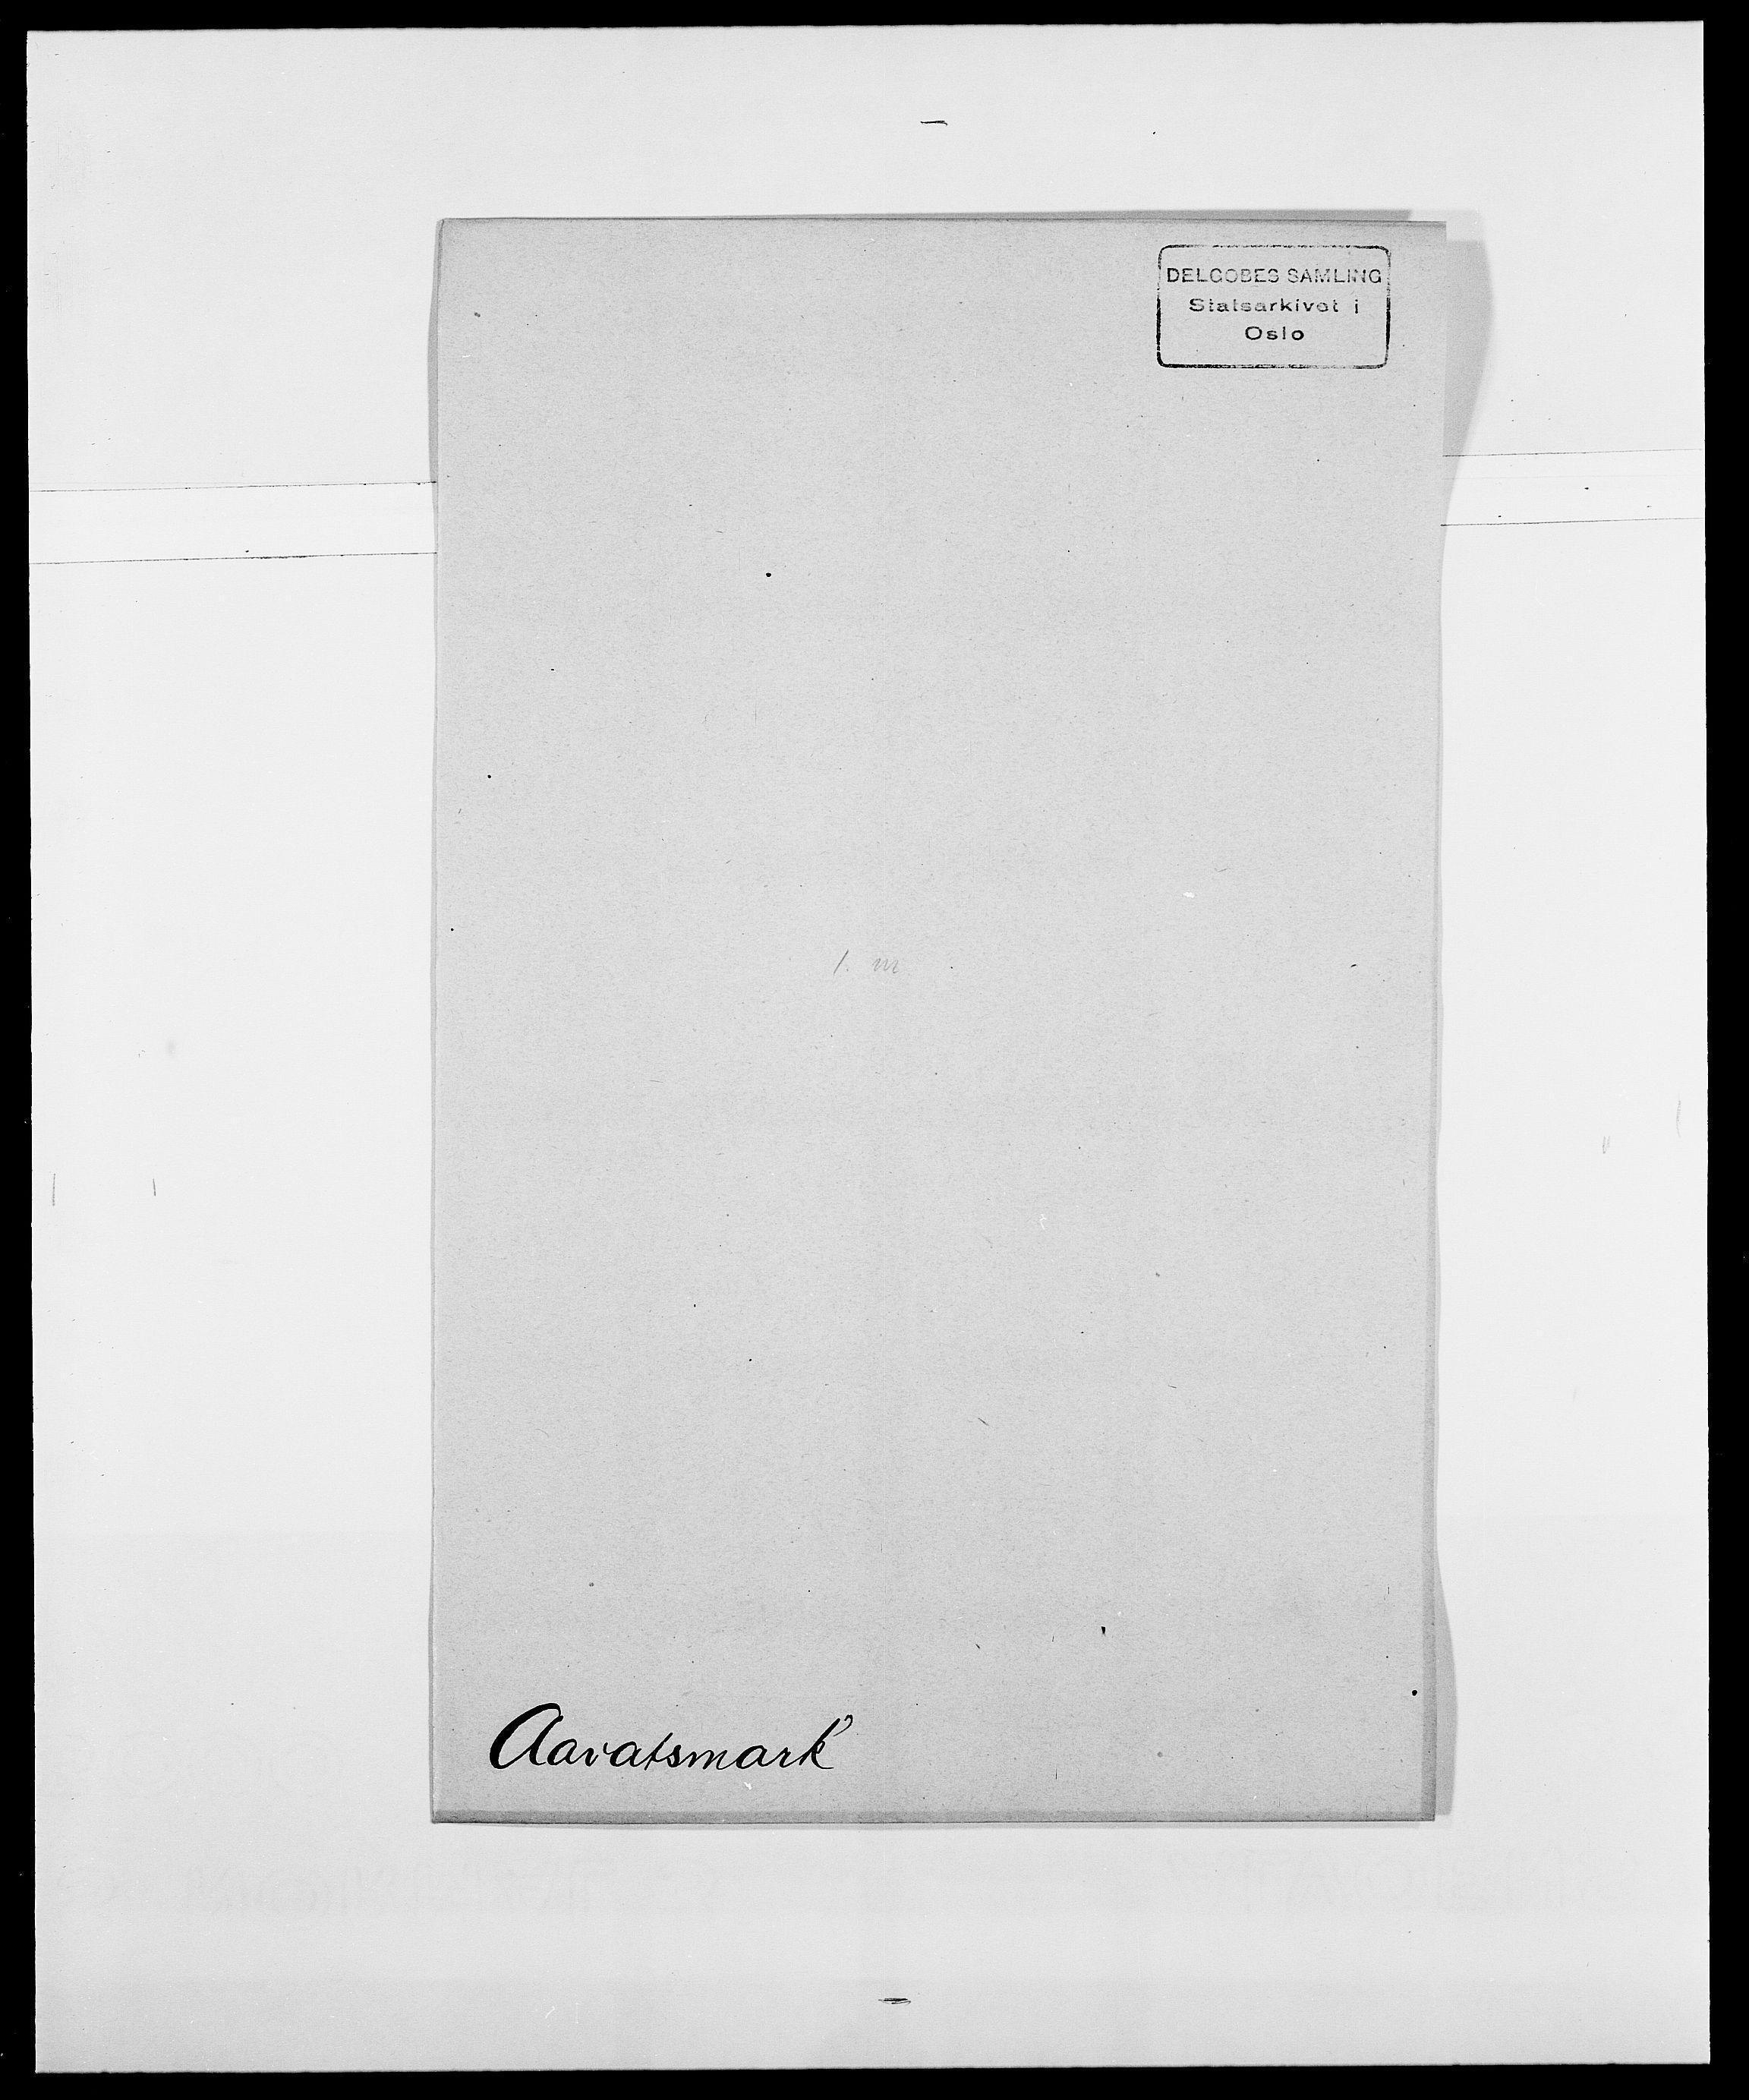 SAO, Delgobe, Charles Antoine - samling, D/Da/L0001: Aabye - Angerman, s. 165